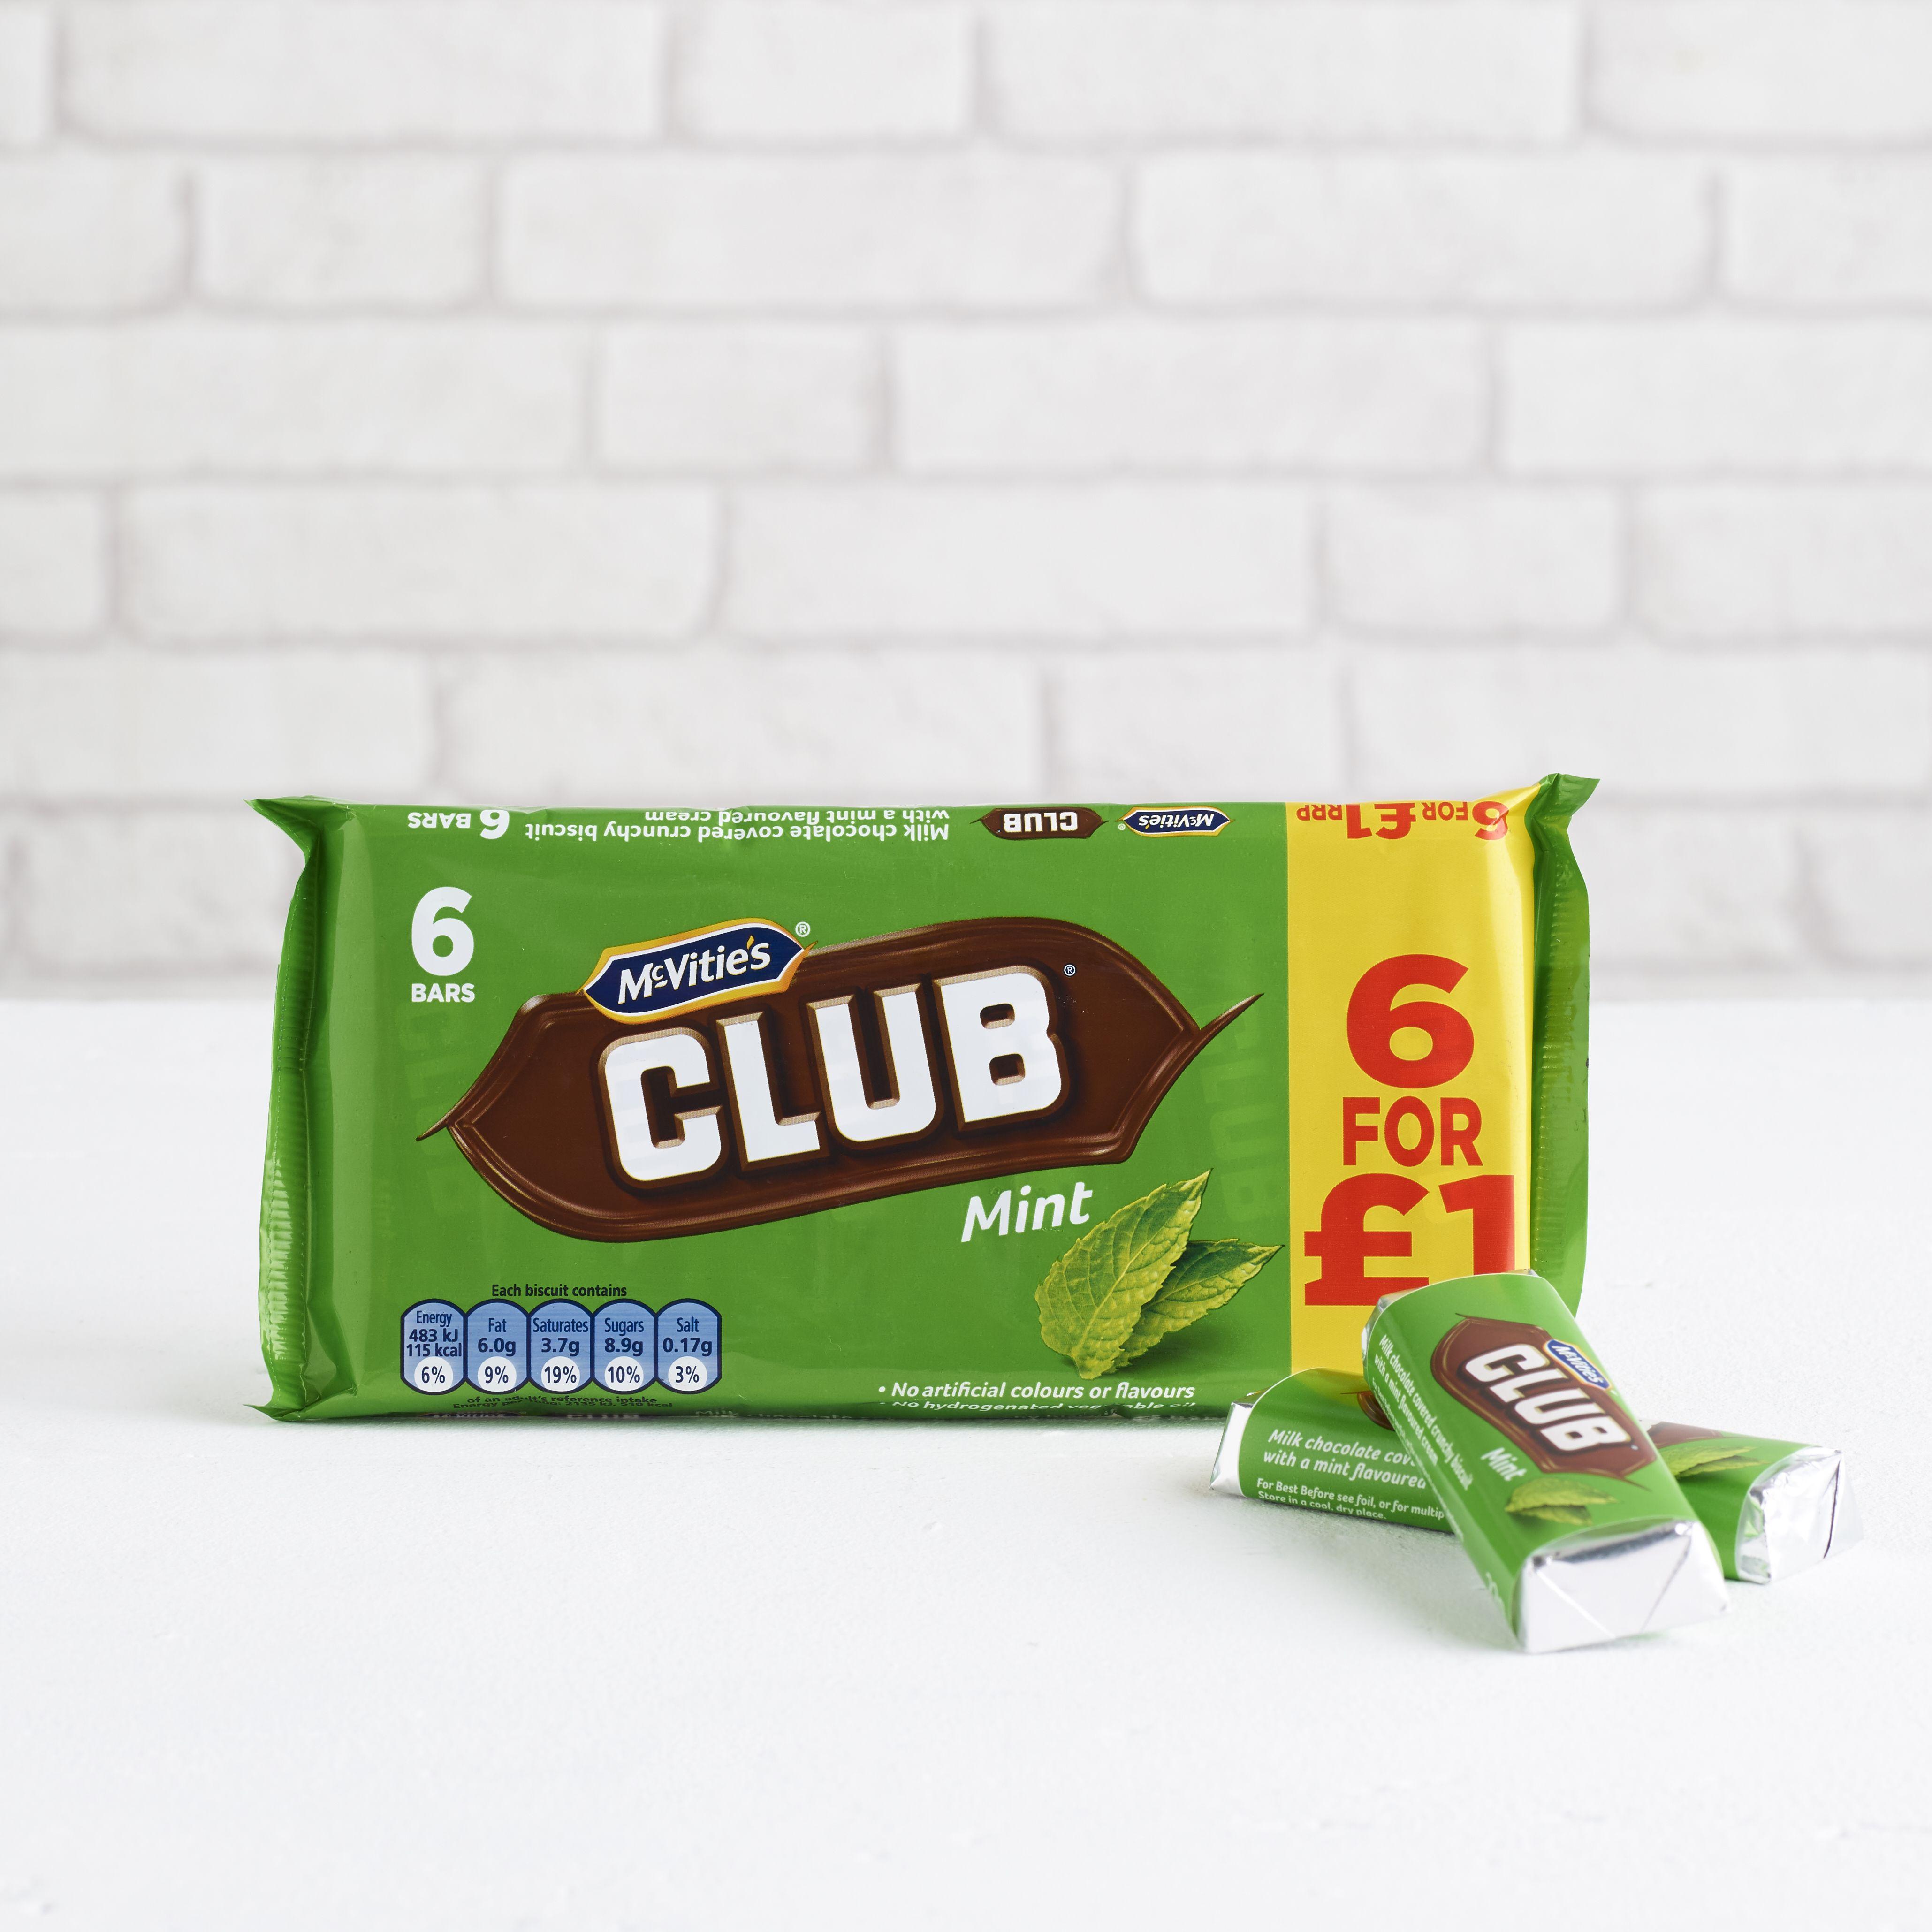 McVitie's Mint Chocolate Club, 6 pack